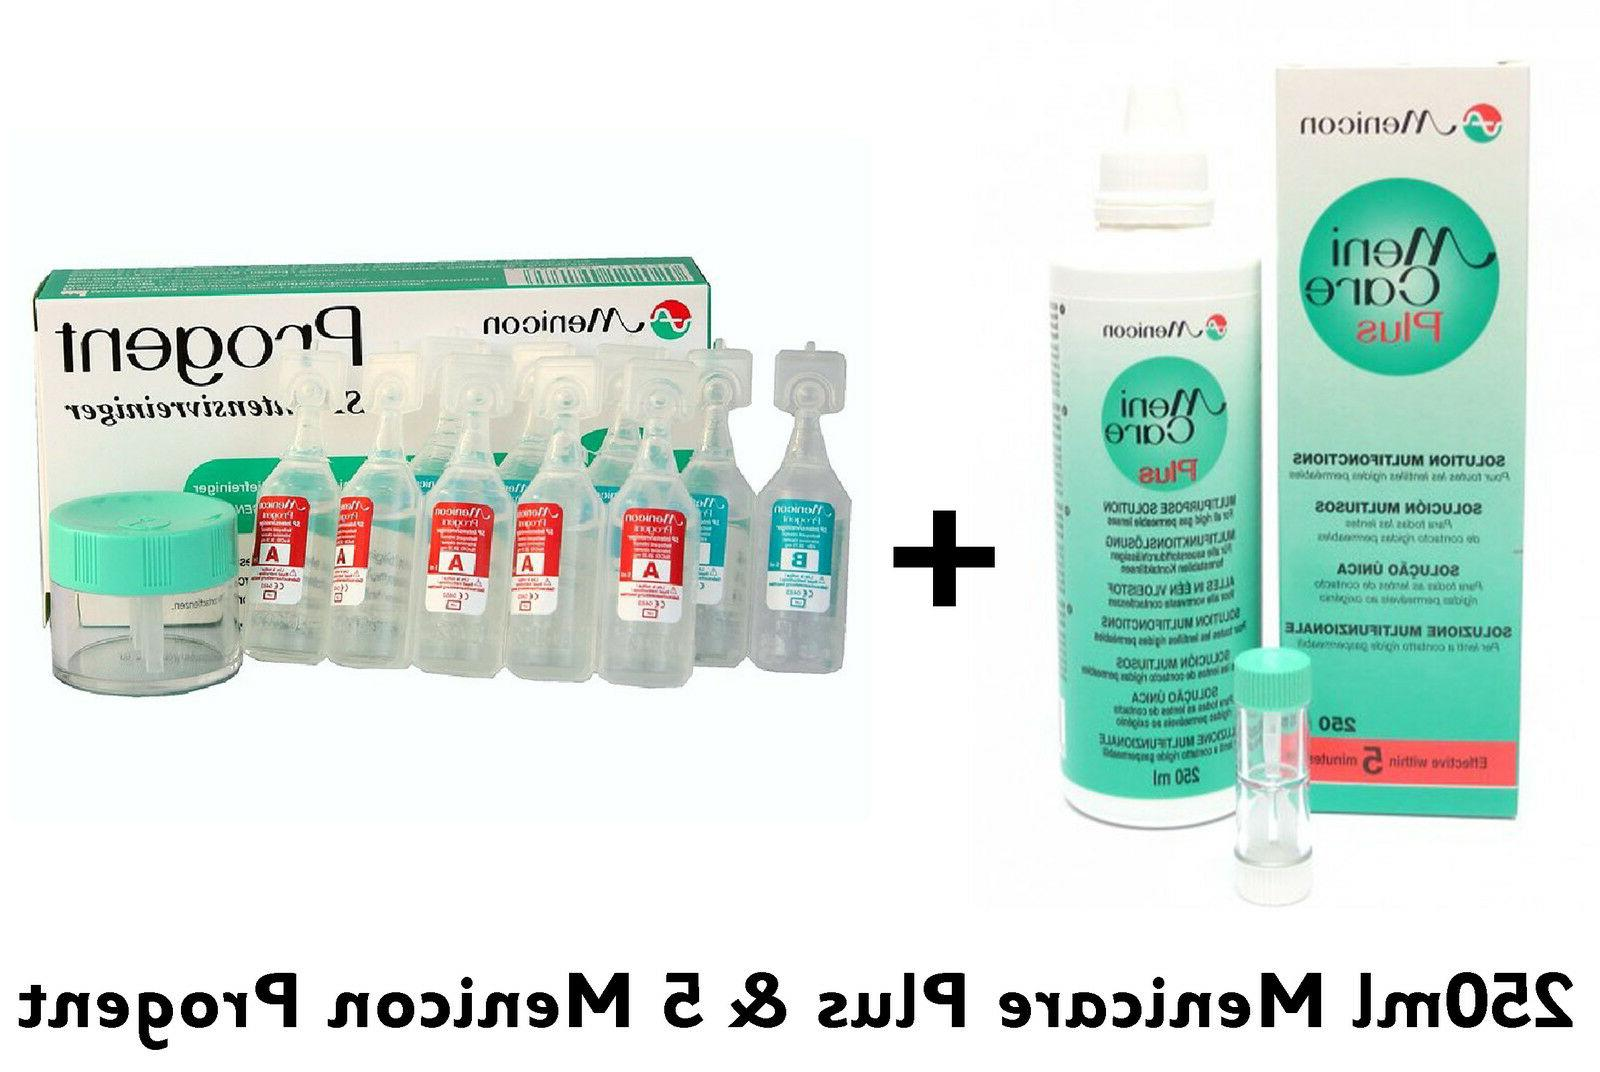 250ml menicare plus contact lens solution 5